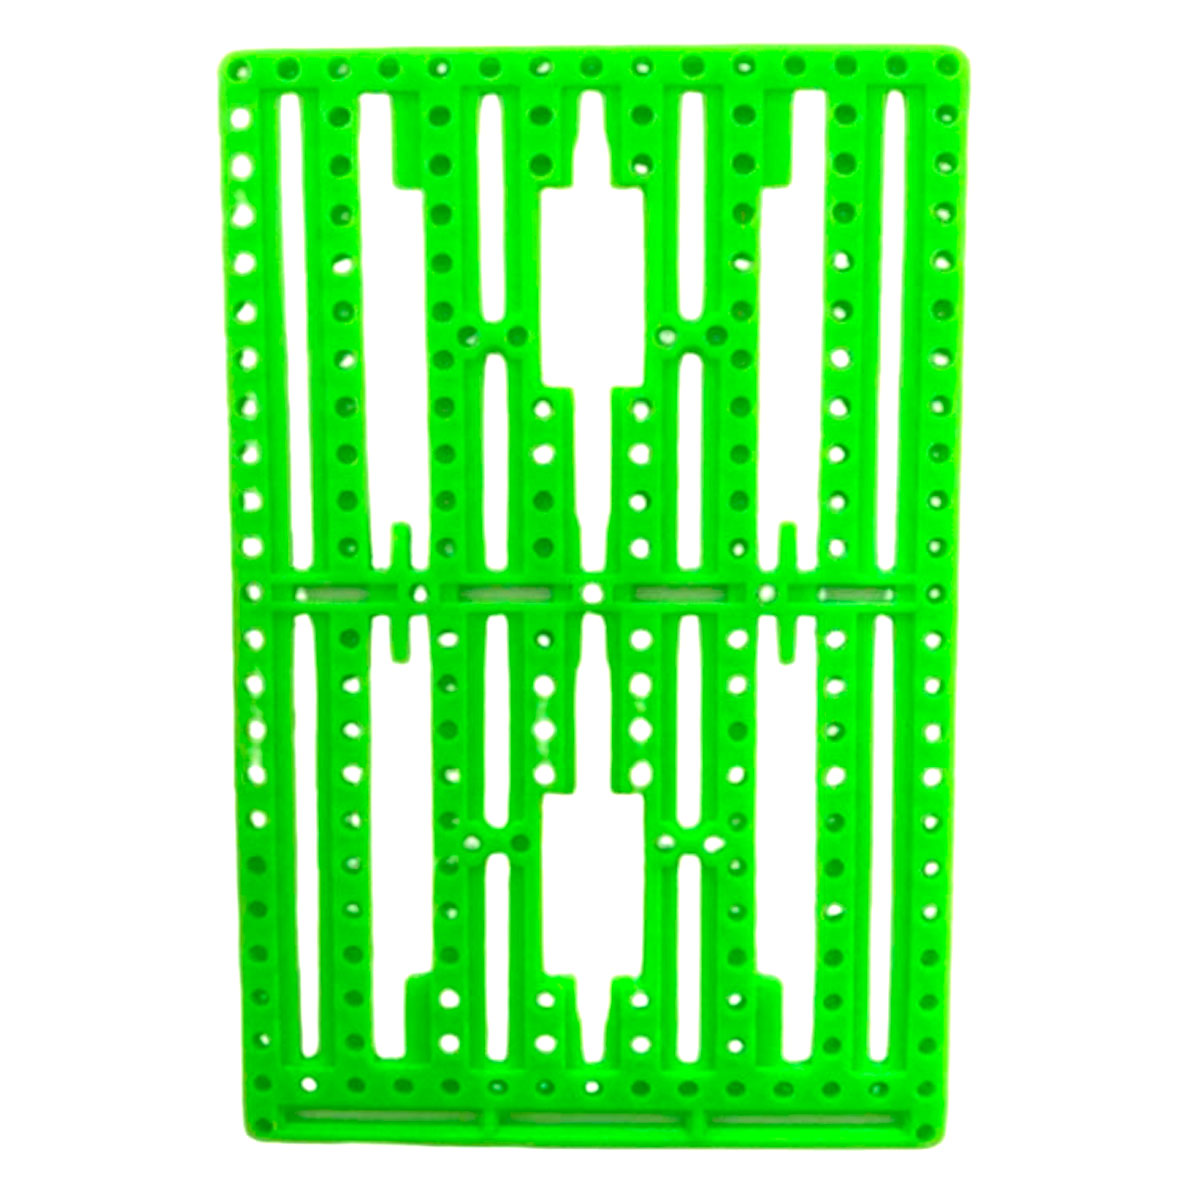 Base Plástica para Projetos - DIY - 12cm x 7,5cm